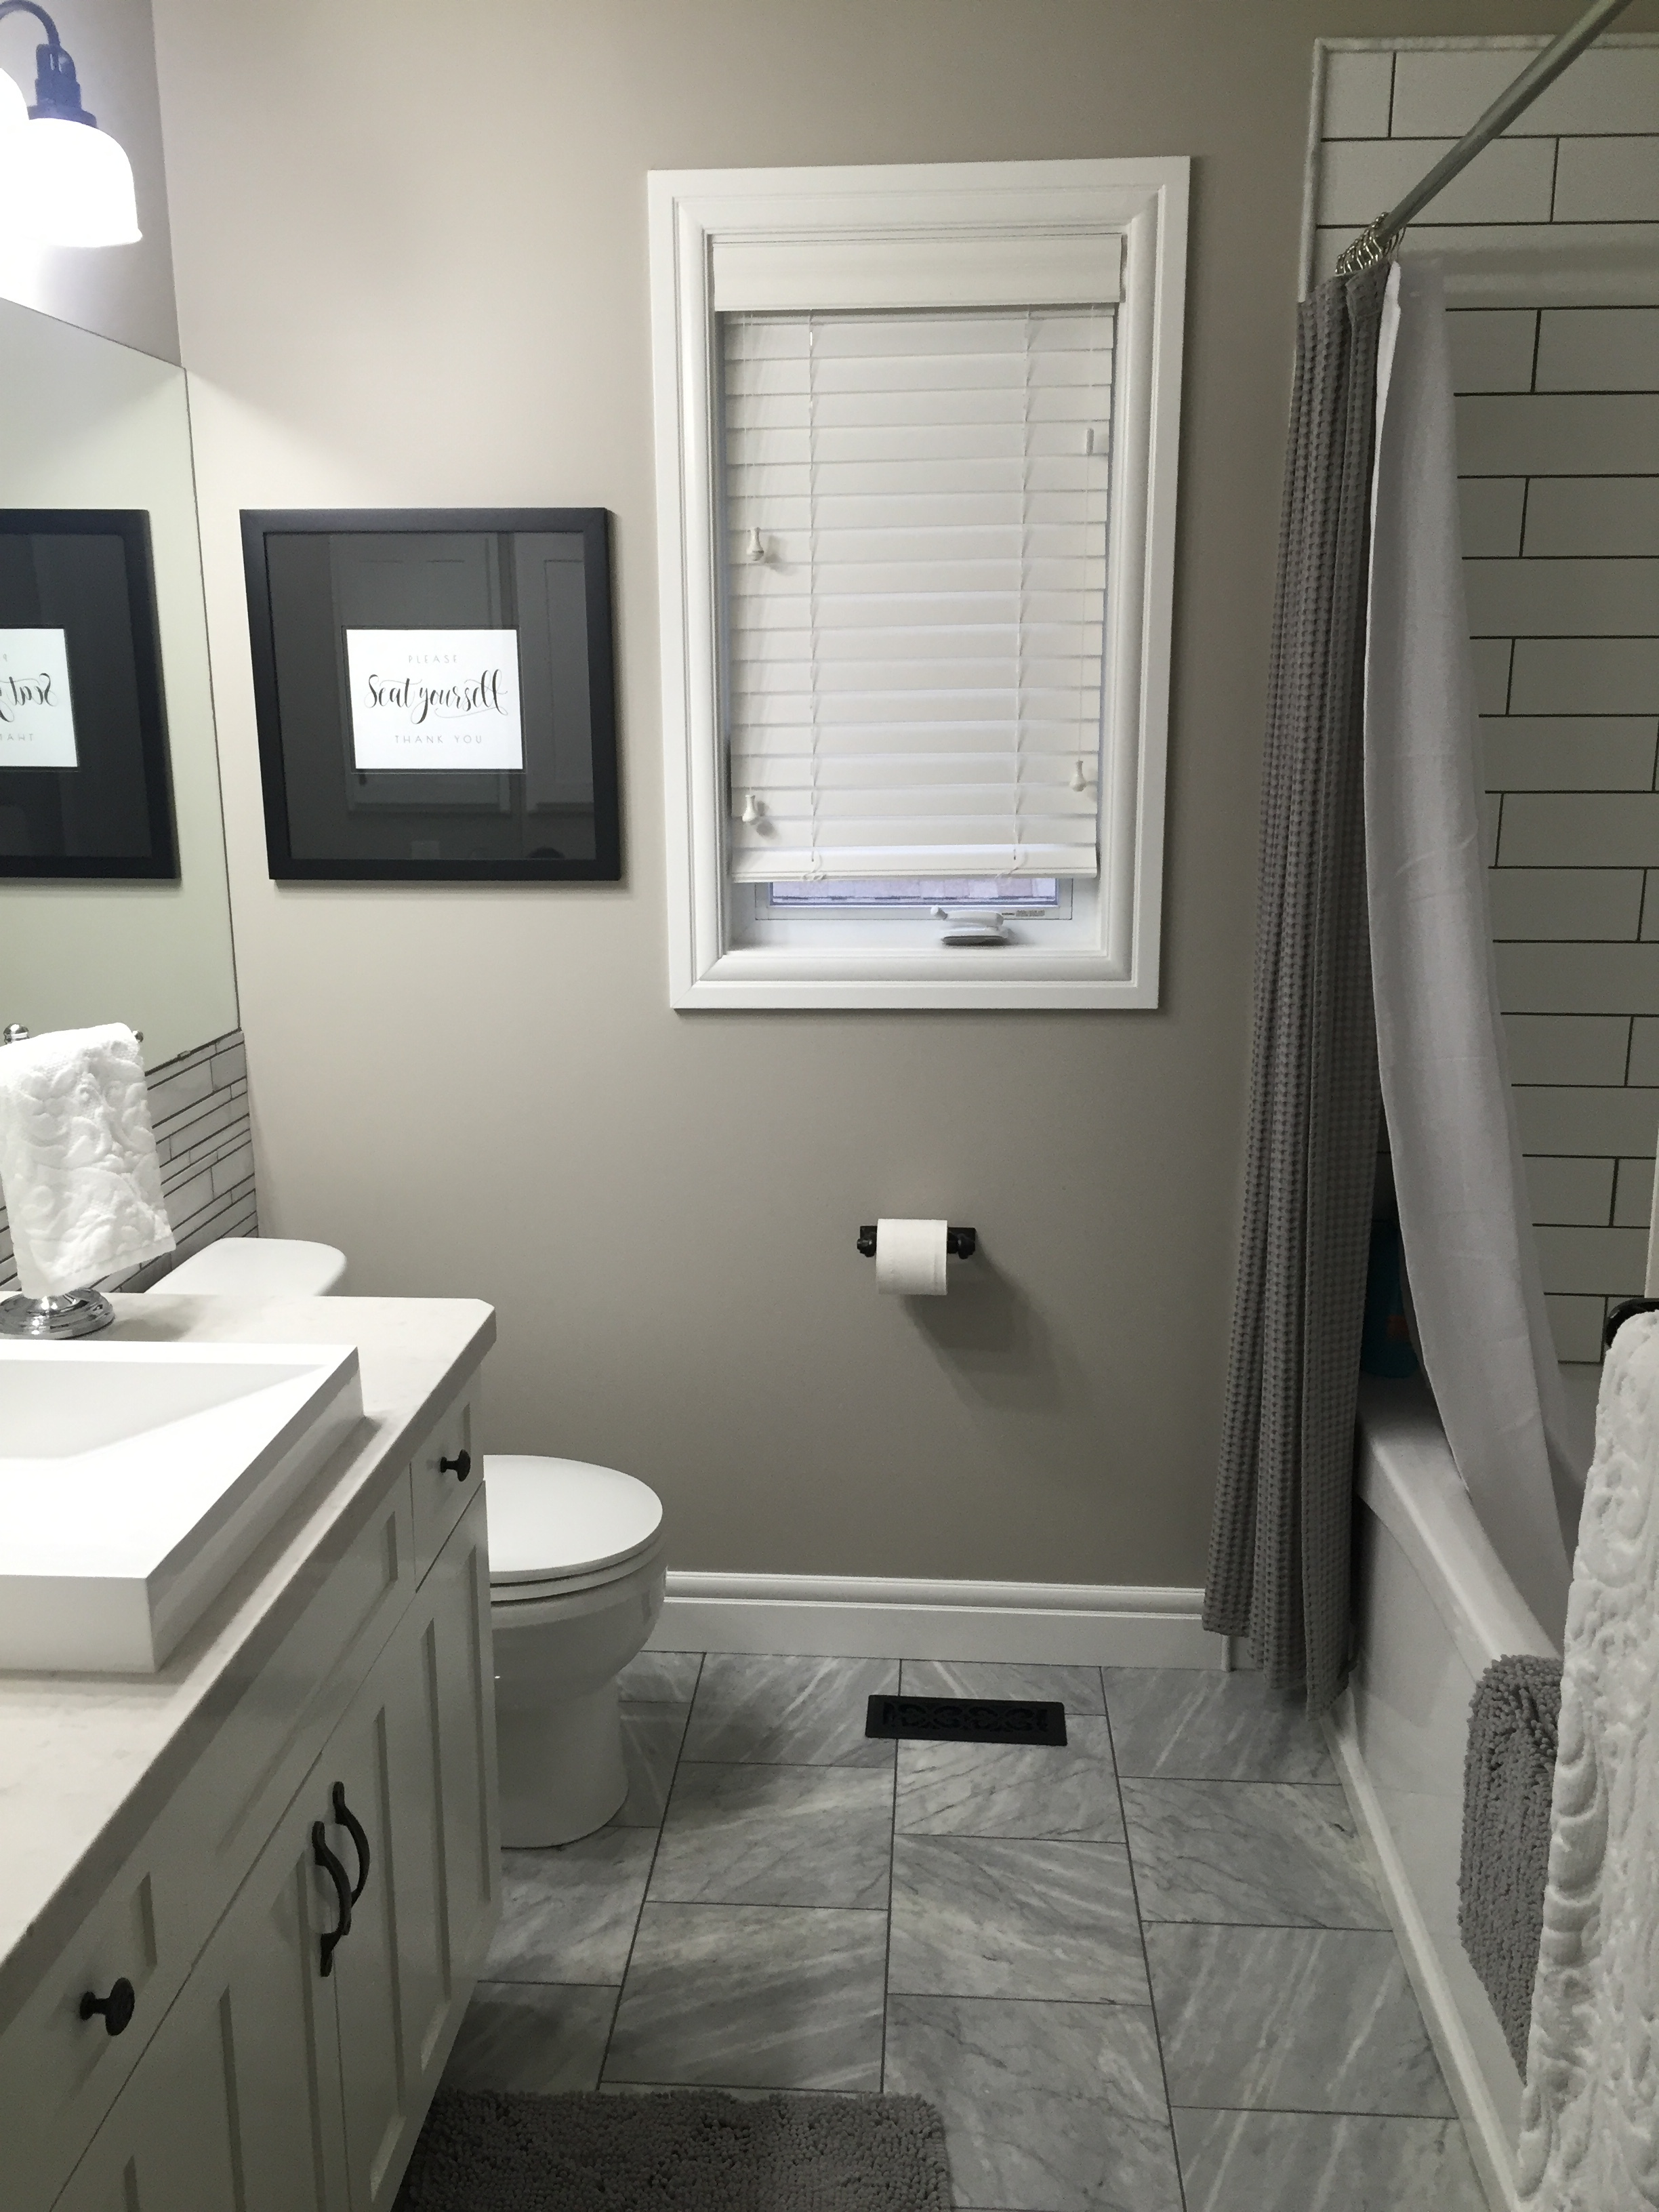 Bianca Carrara floors, white cabinetry, grey walls, white quartz countertops.